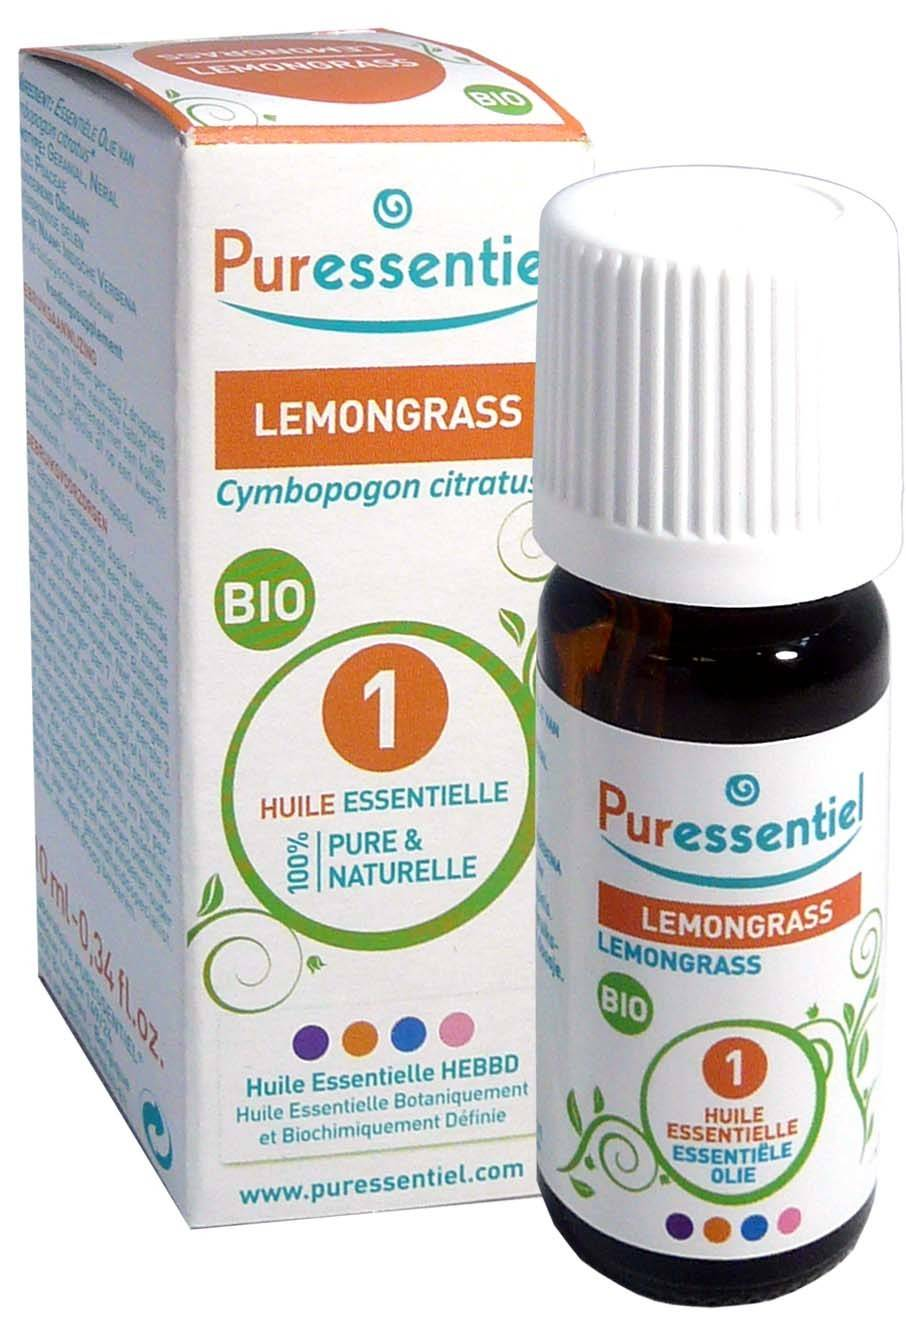 Puressentiel huile essentielle lemongrass bio 5ml